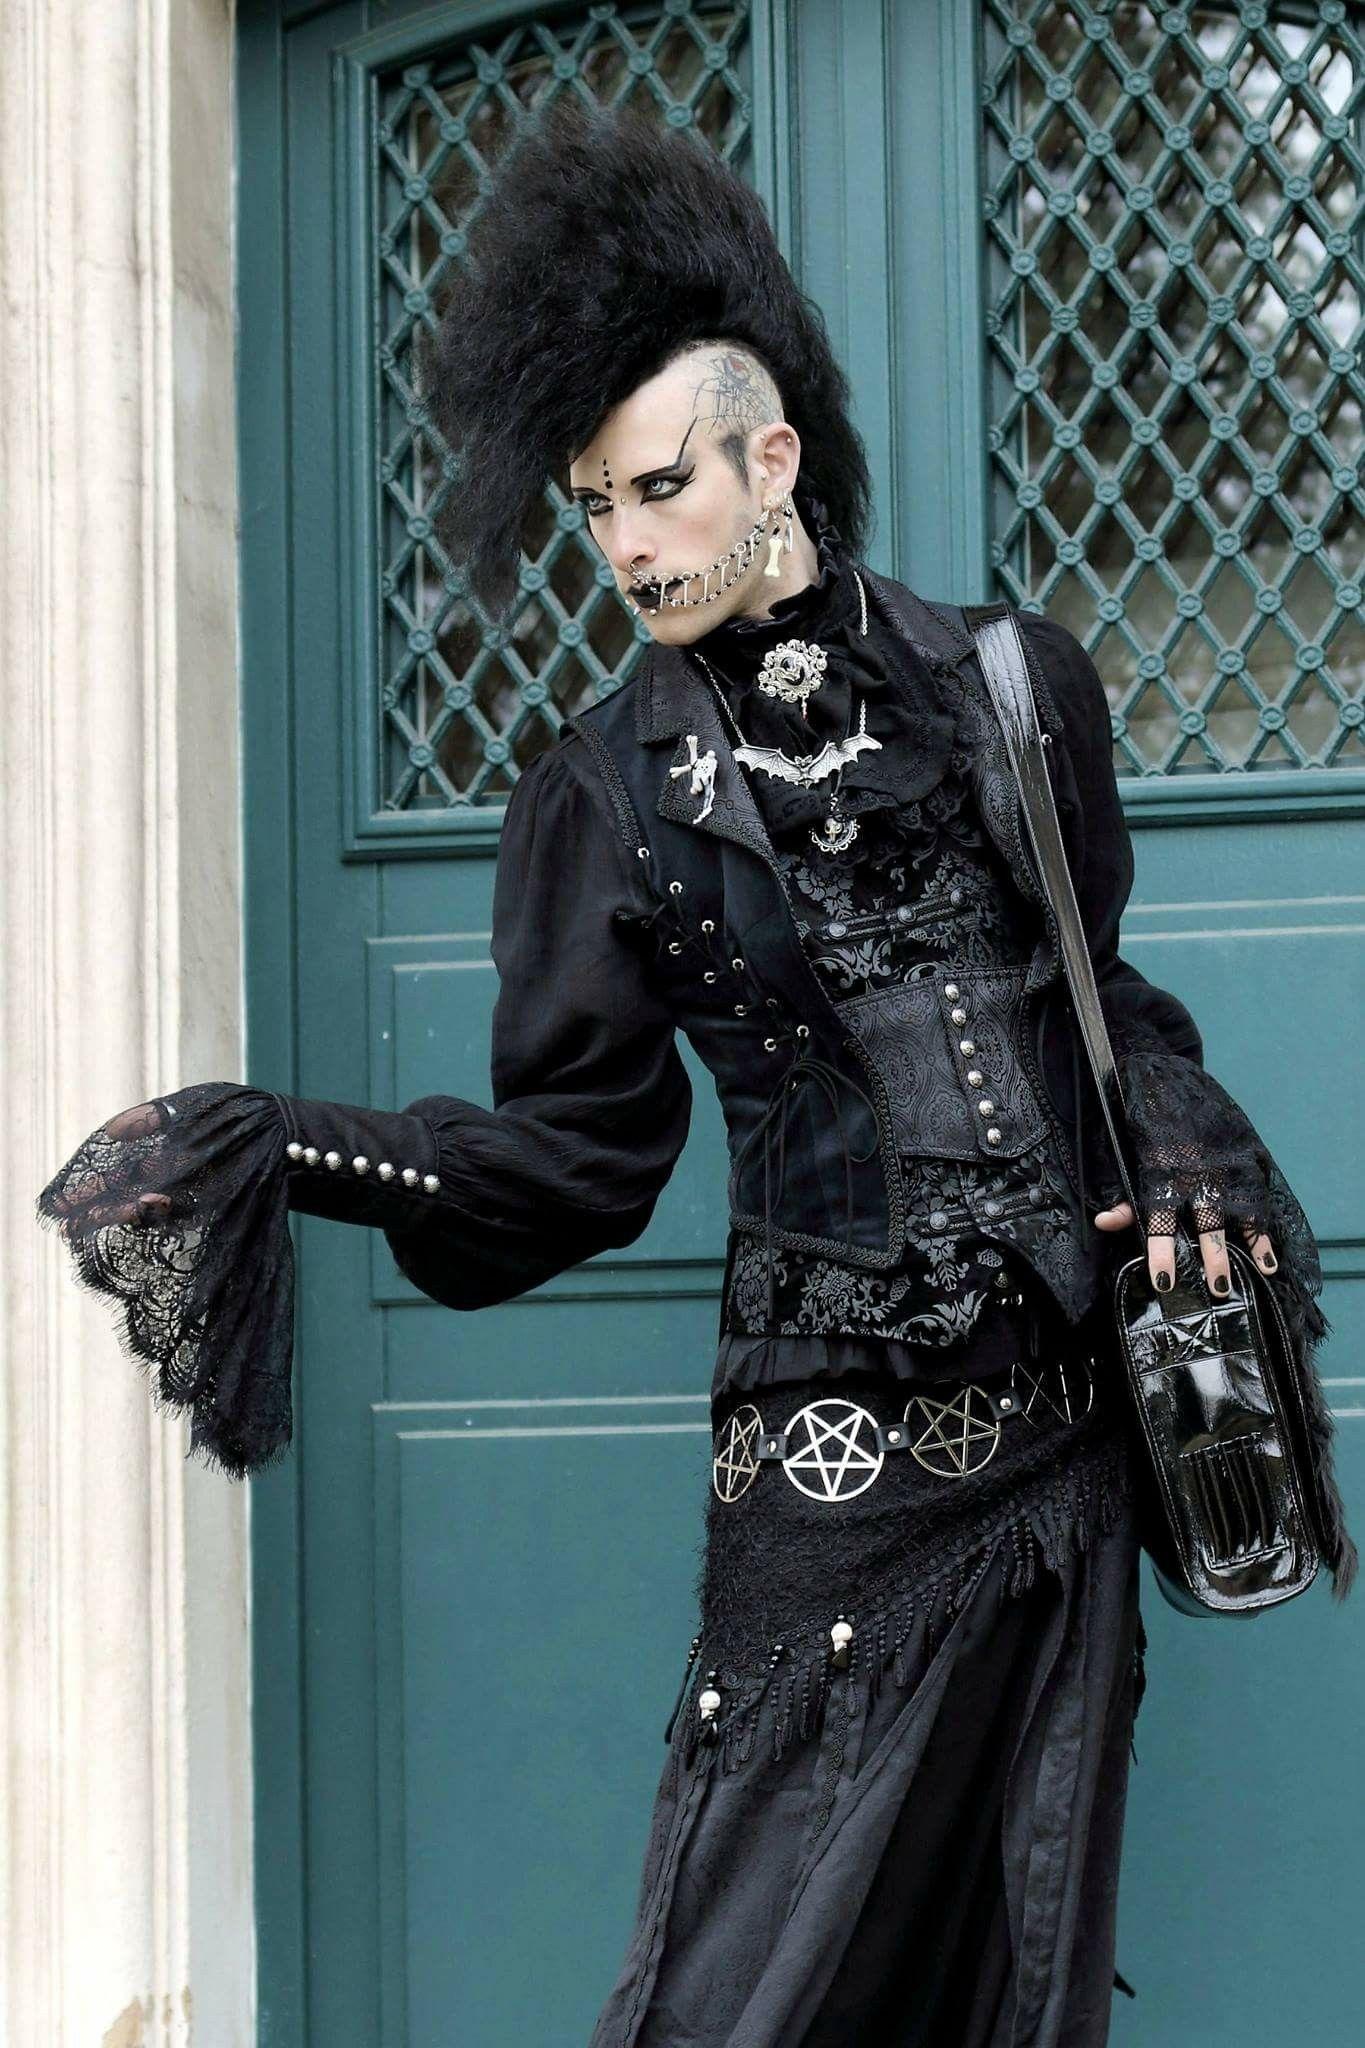 Pin by August Jackson on Spooki dudes | Goth fashion, Goth